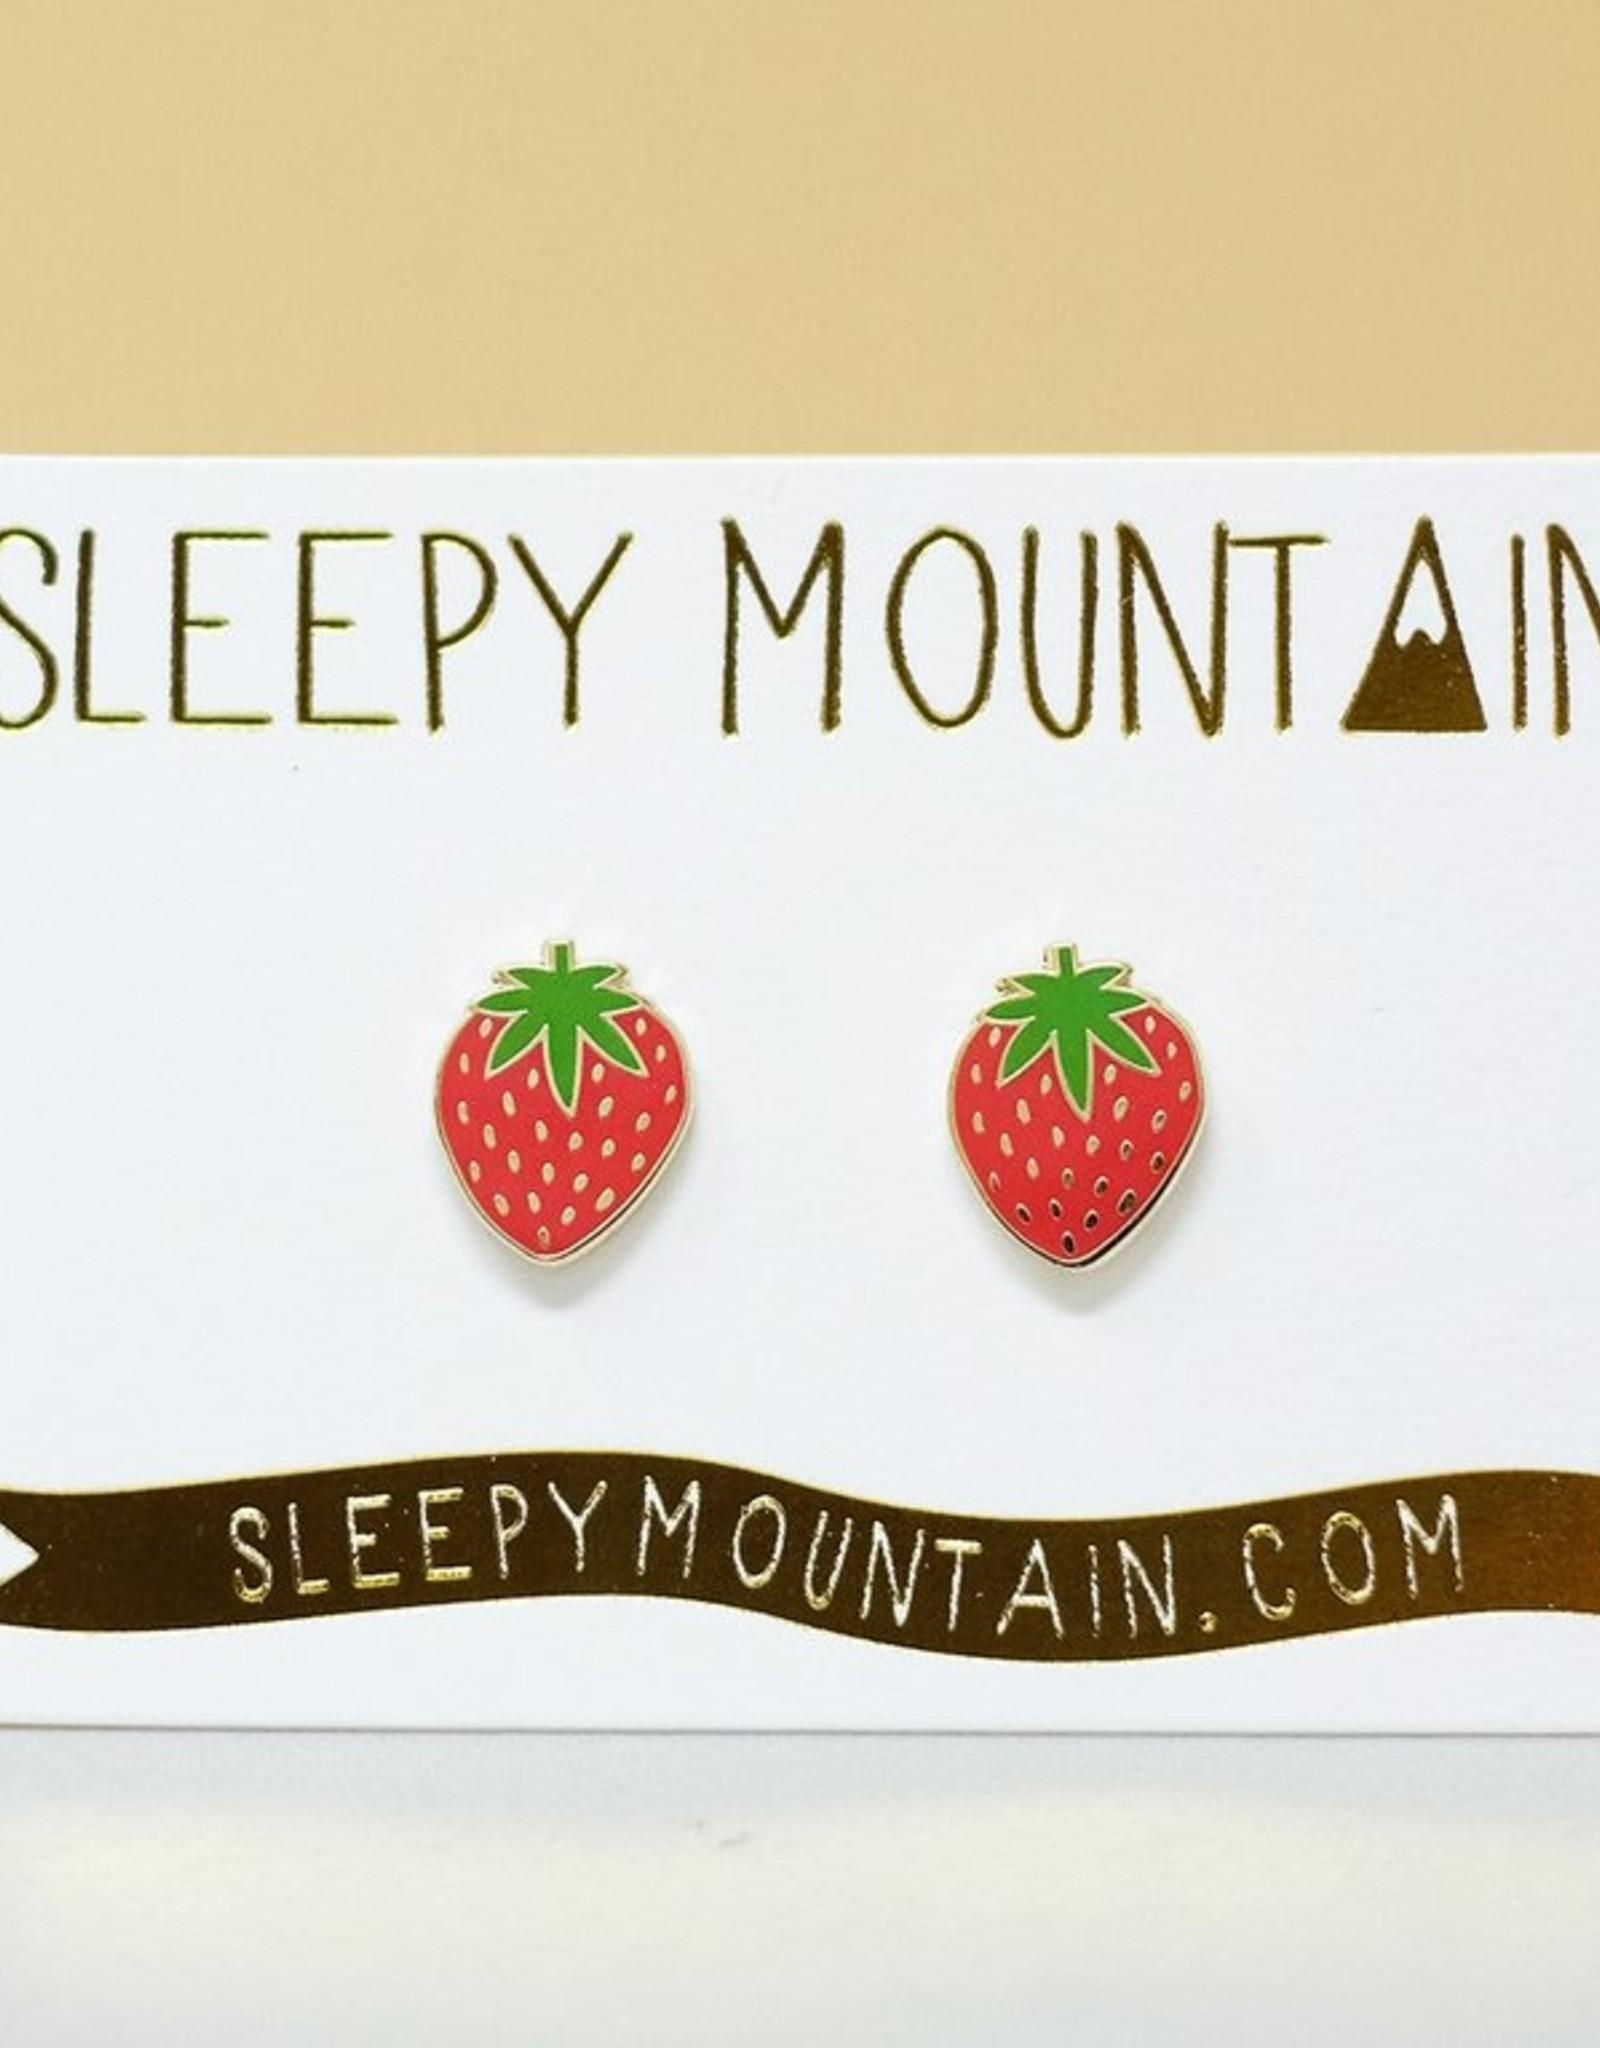 Sleepy Mountain Assorted Gold Plated Stud Earrings by Sleepy Mountain // 1